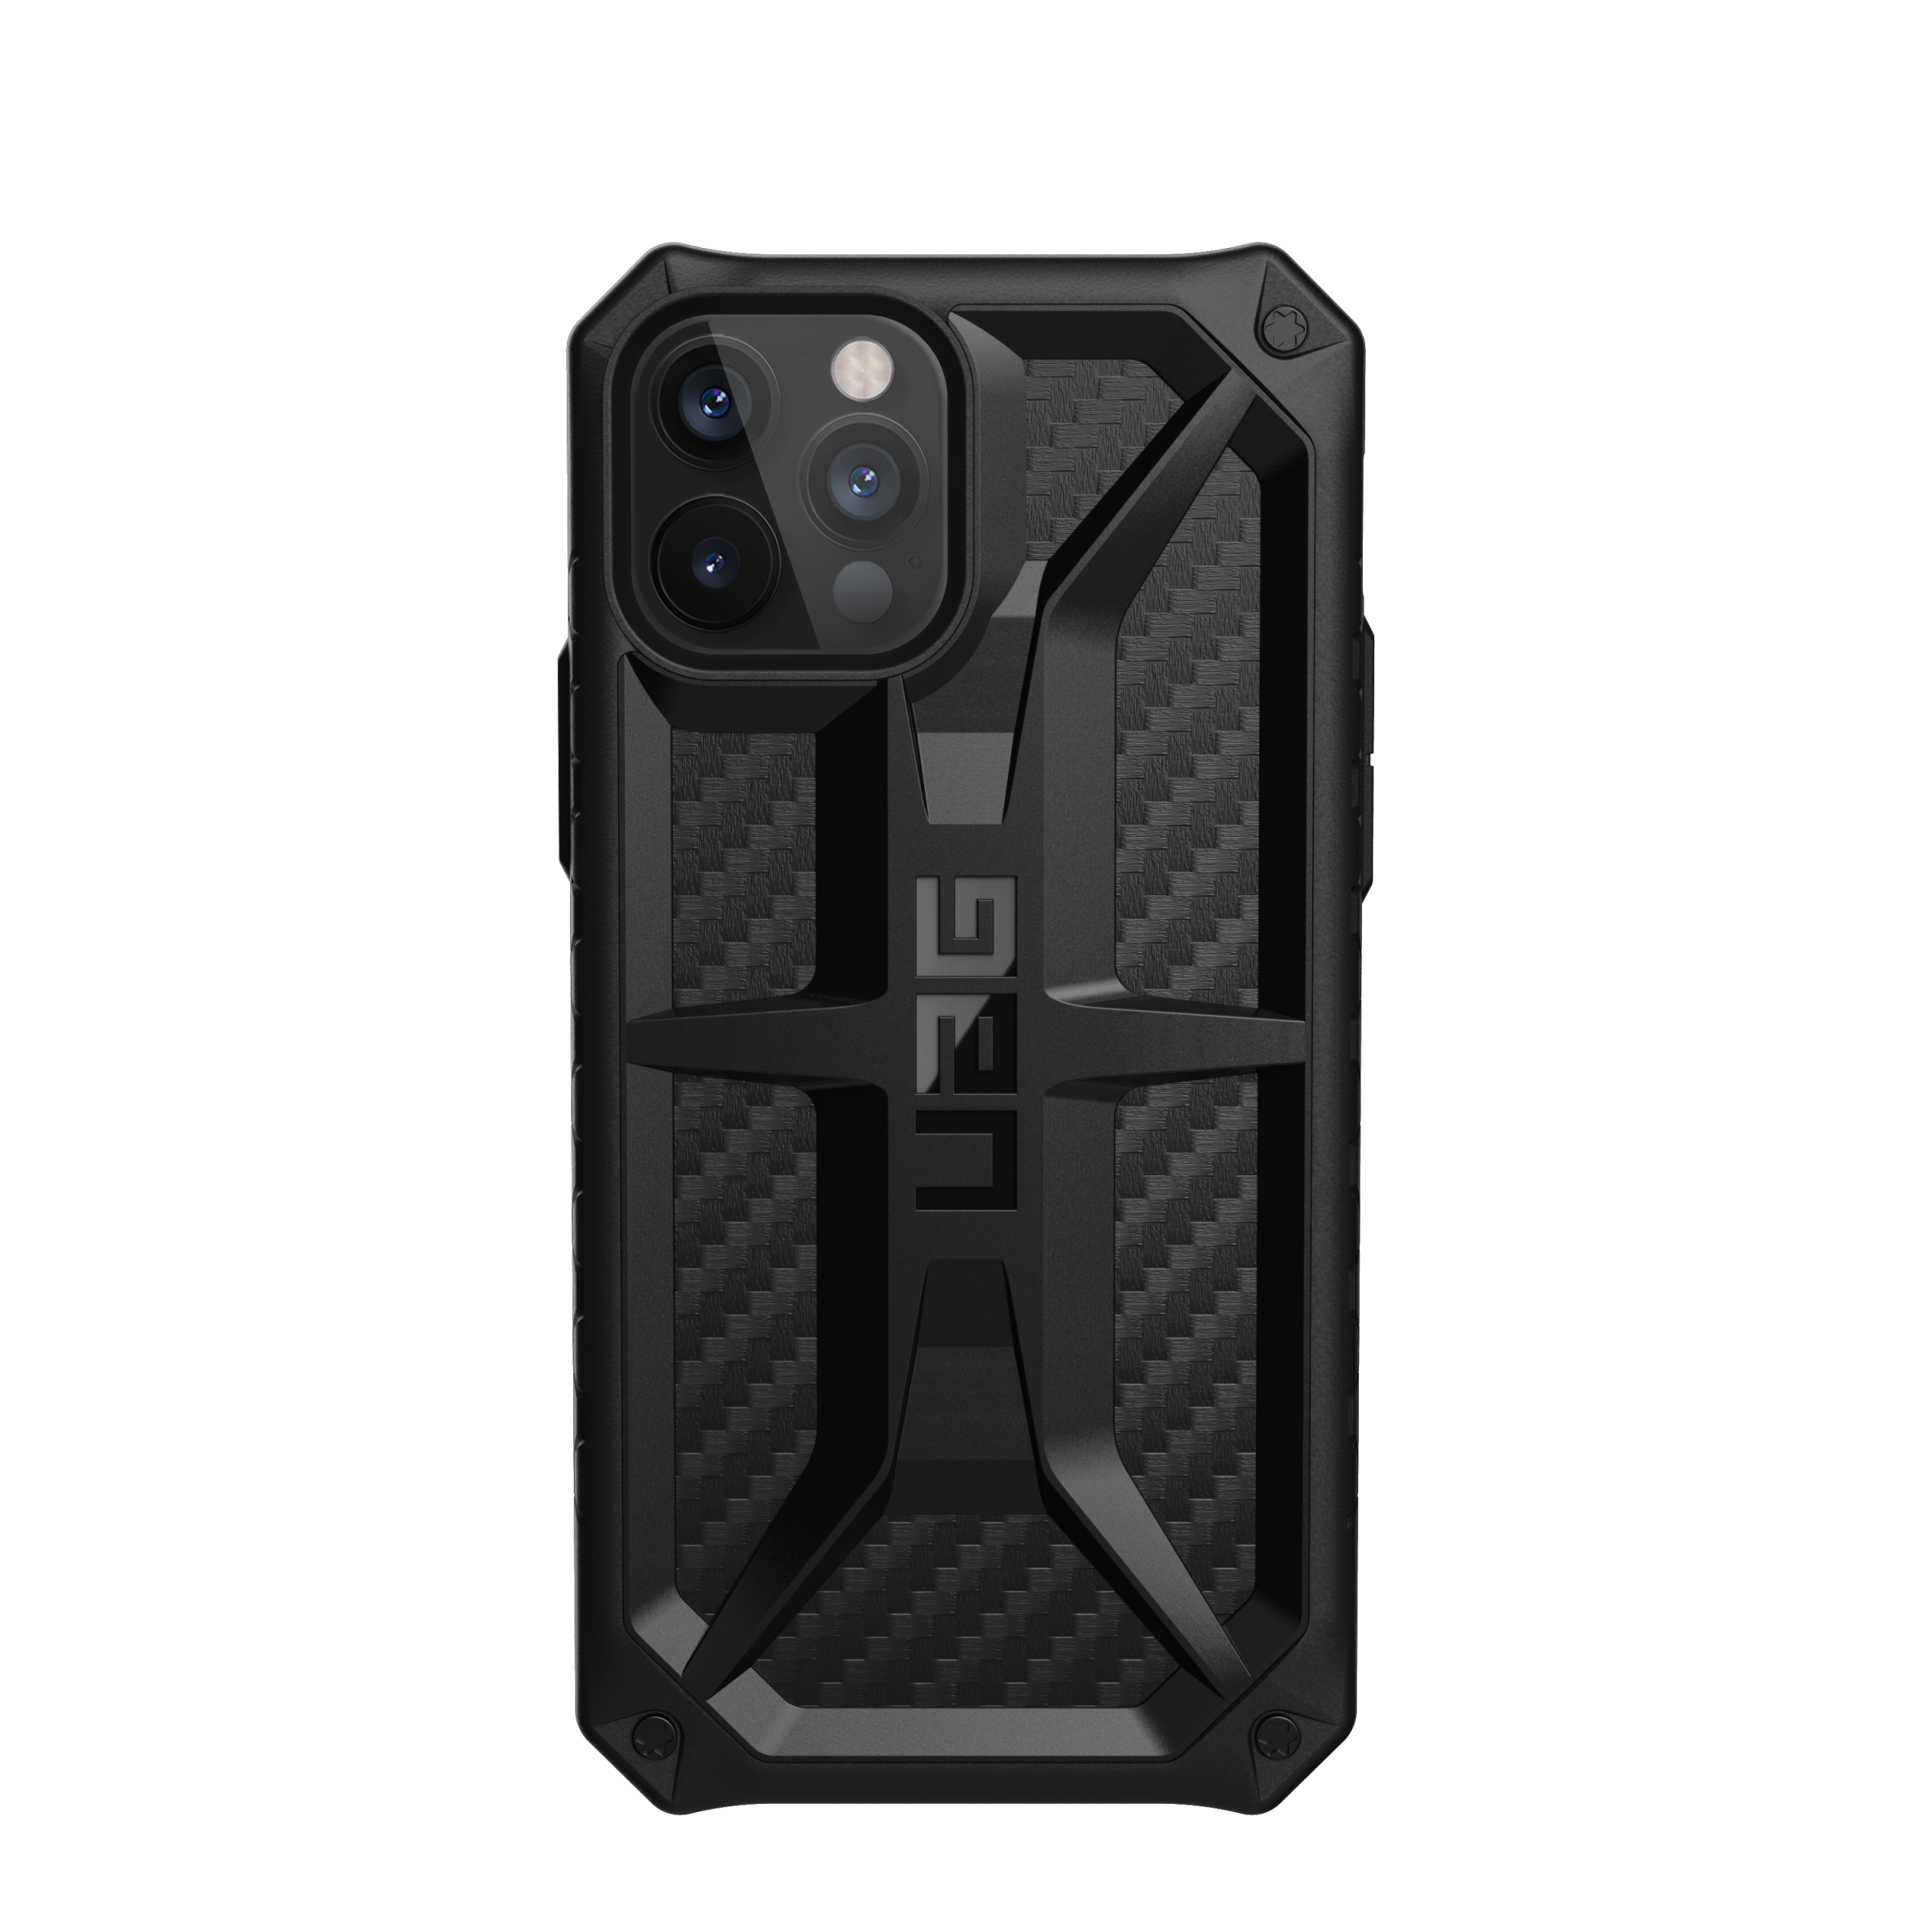 Monarch Series Case iPhone 12 Pro Max Carbon Fiber